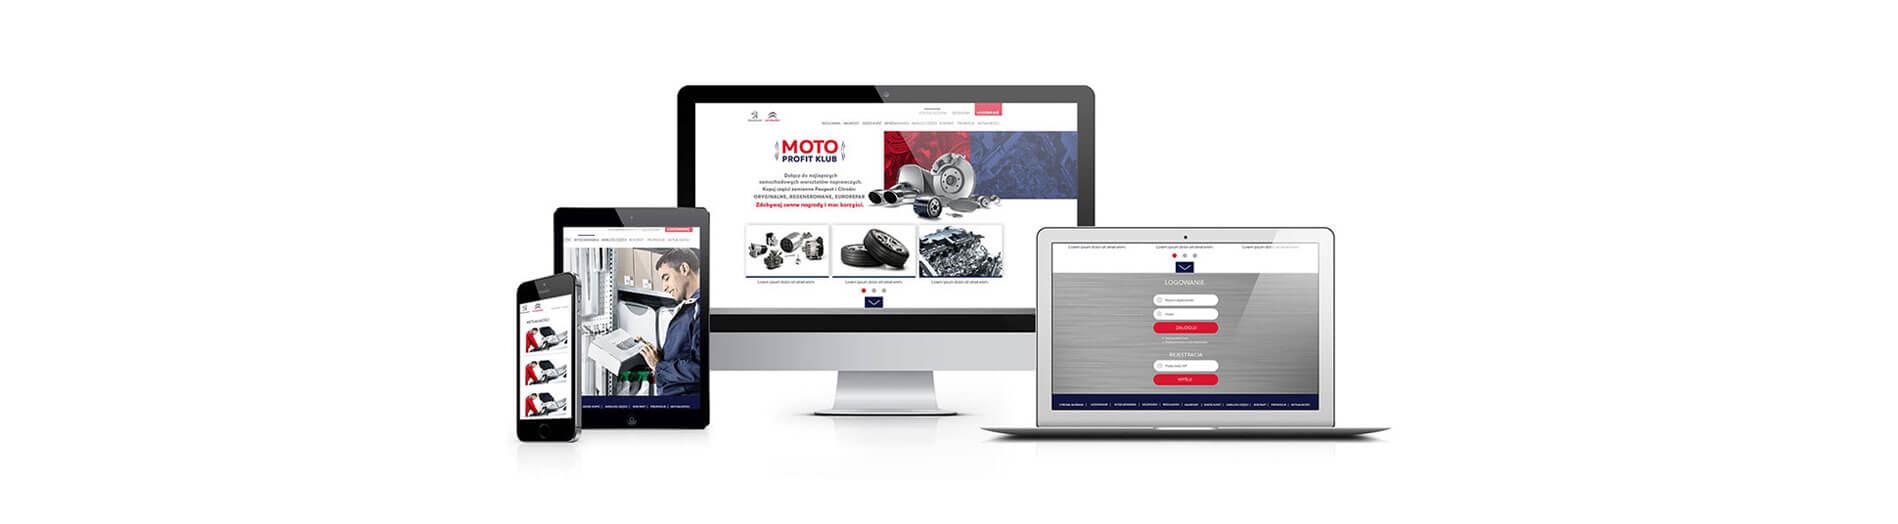 strony internetowe grafika moto profit klub